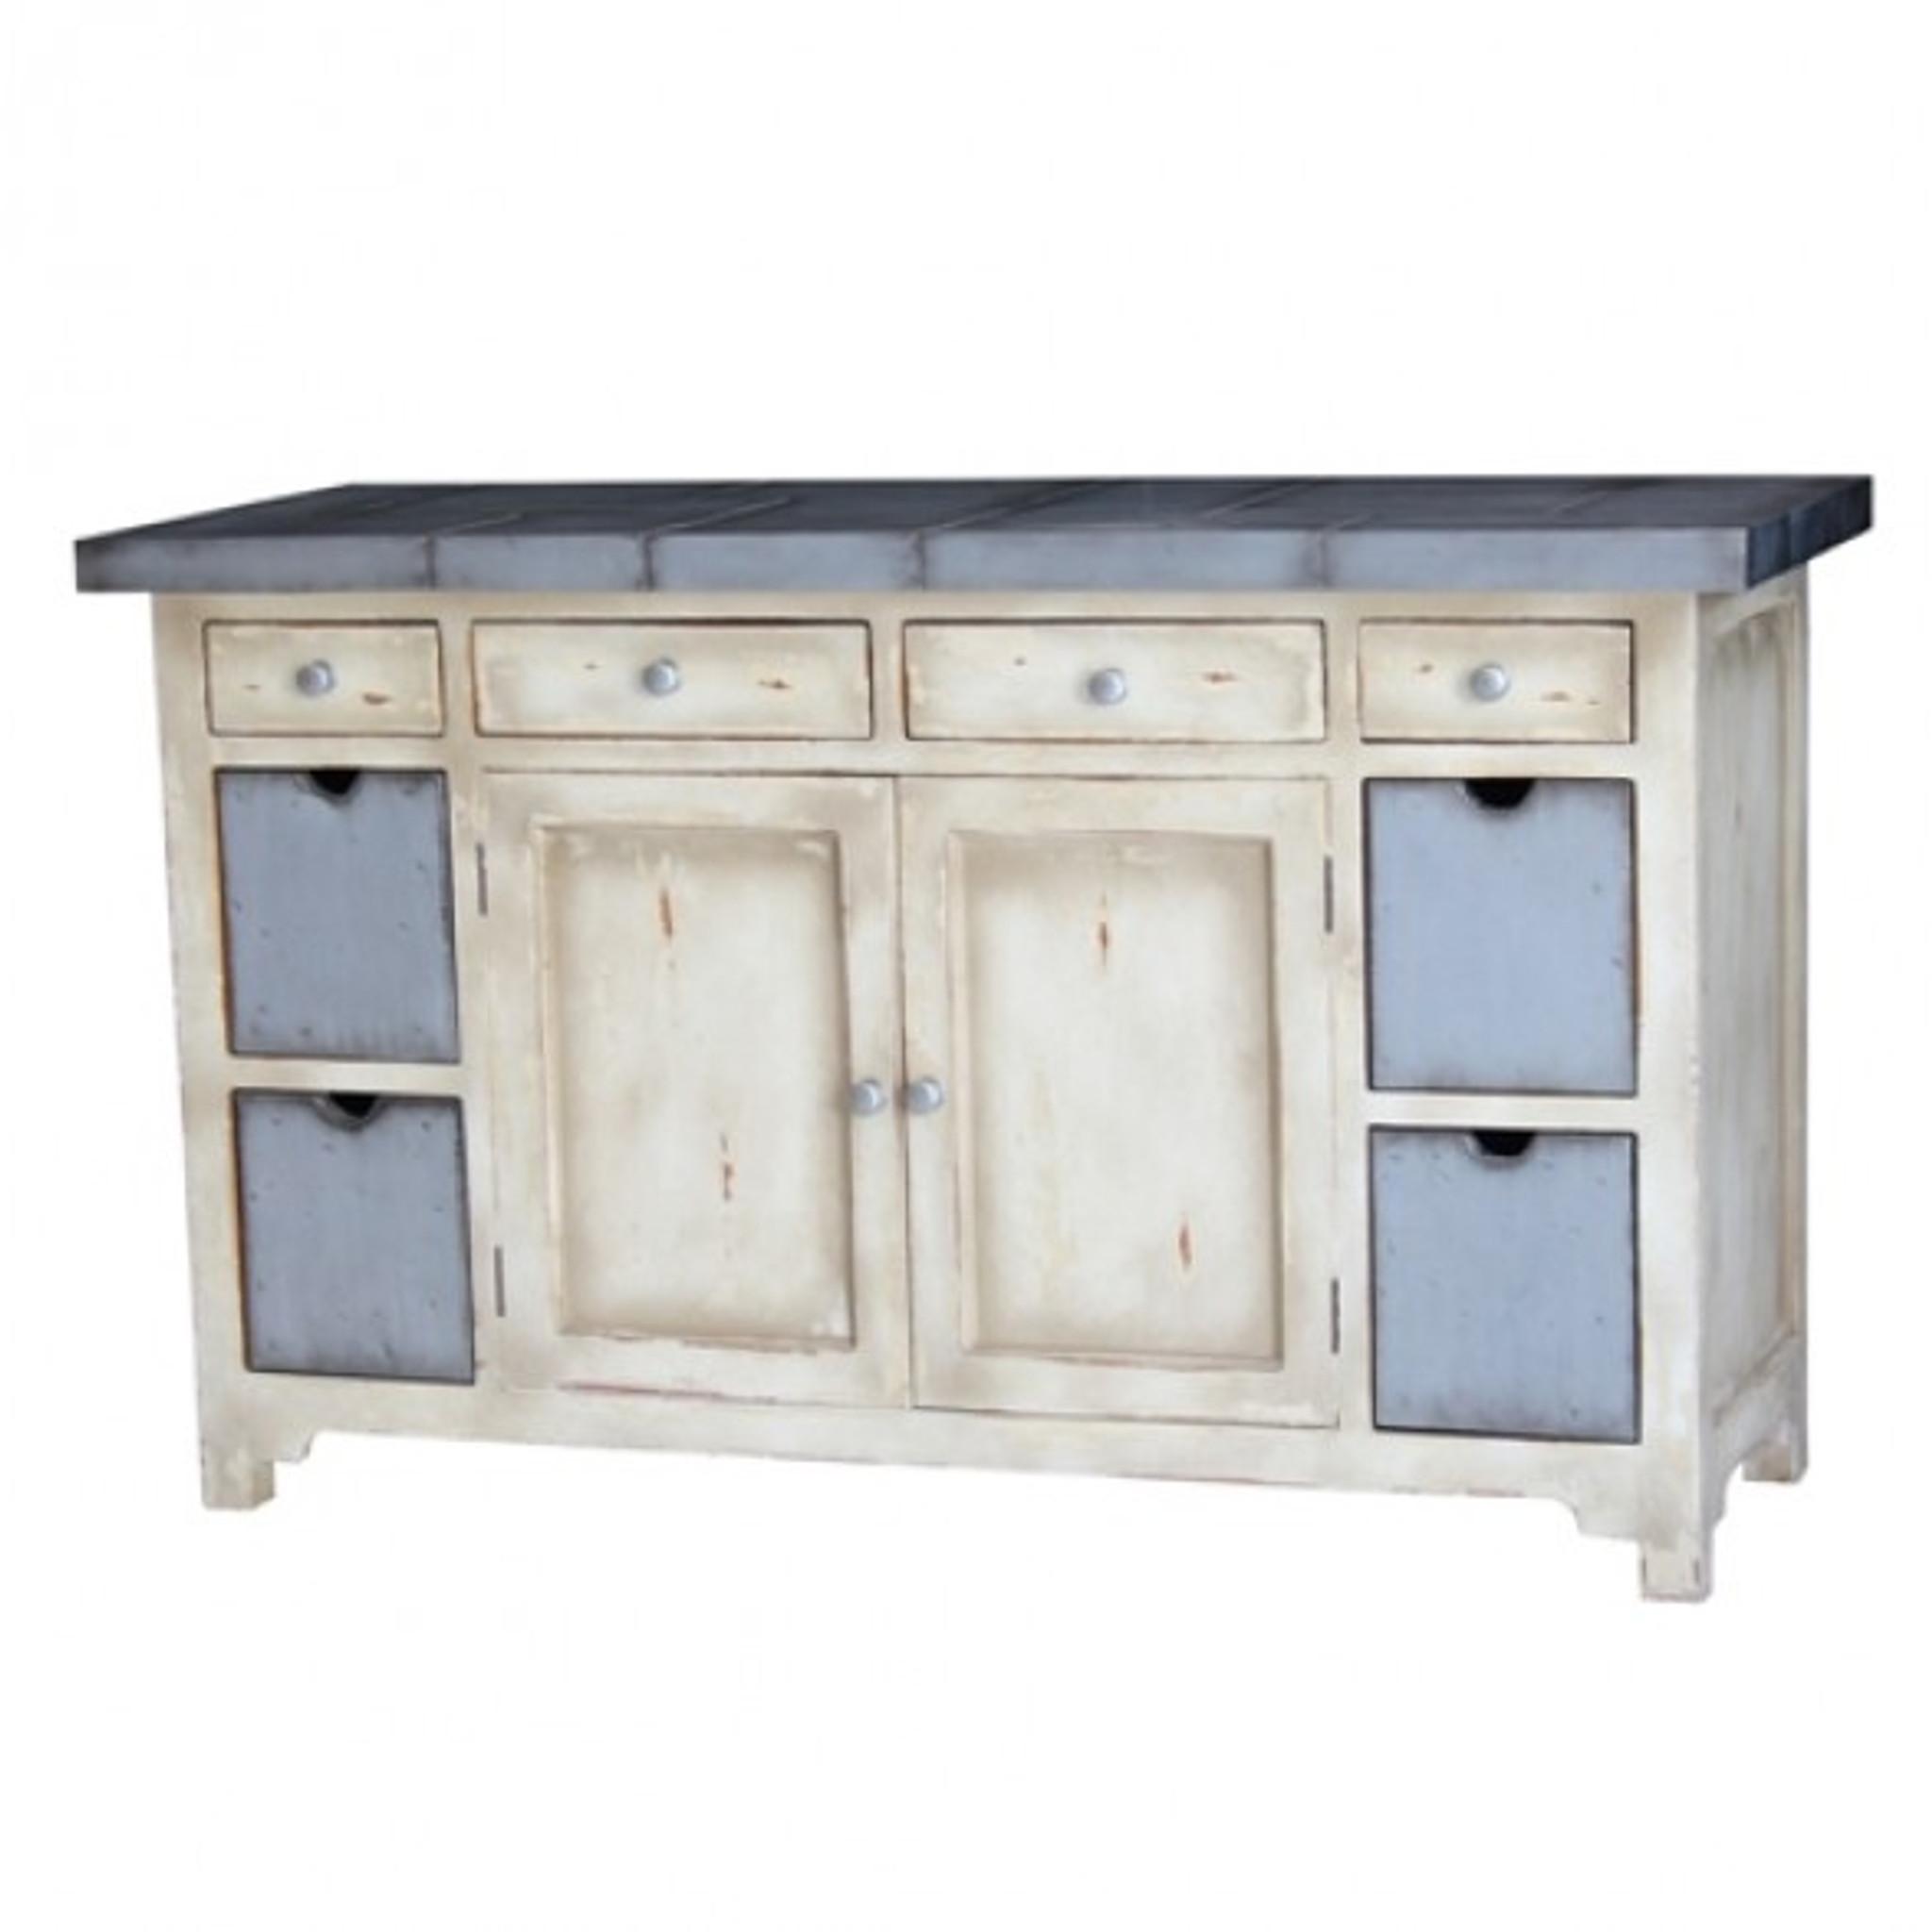 Tin Smith Kitchen Organizer Size 90h X 150w X 55d Cm